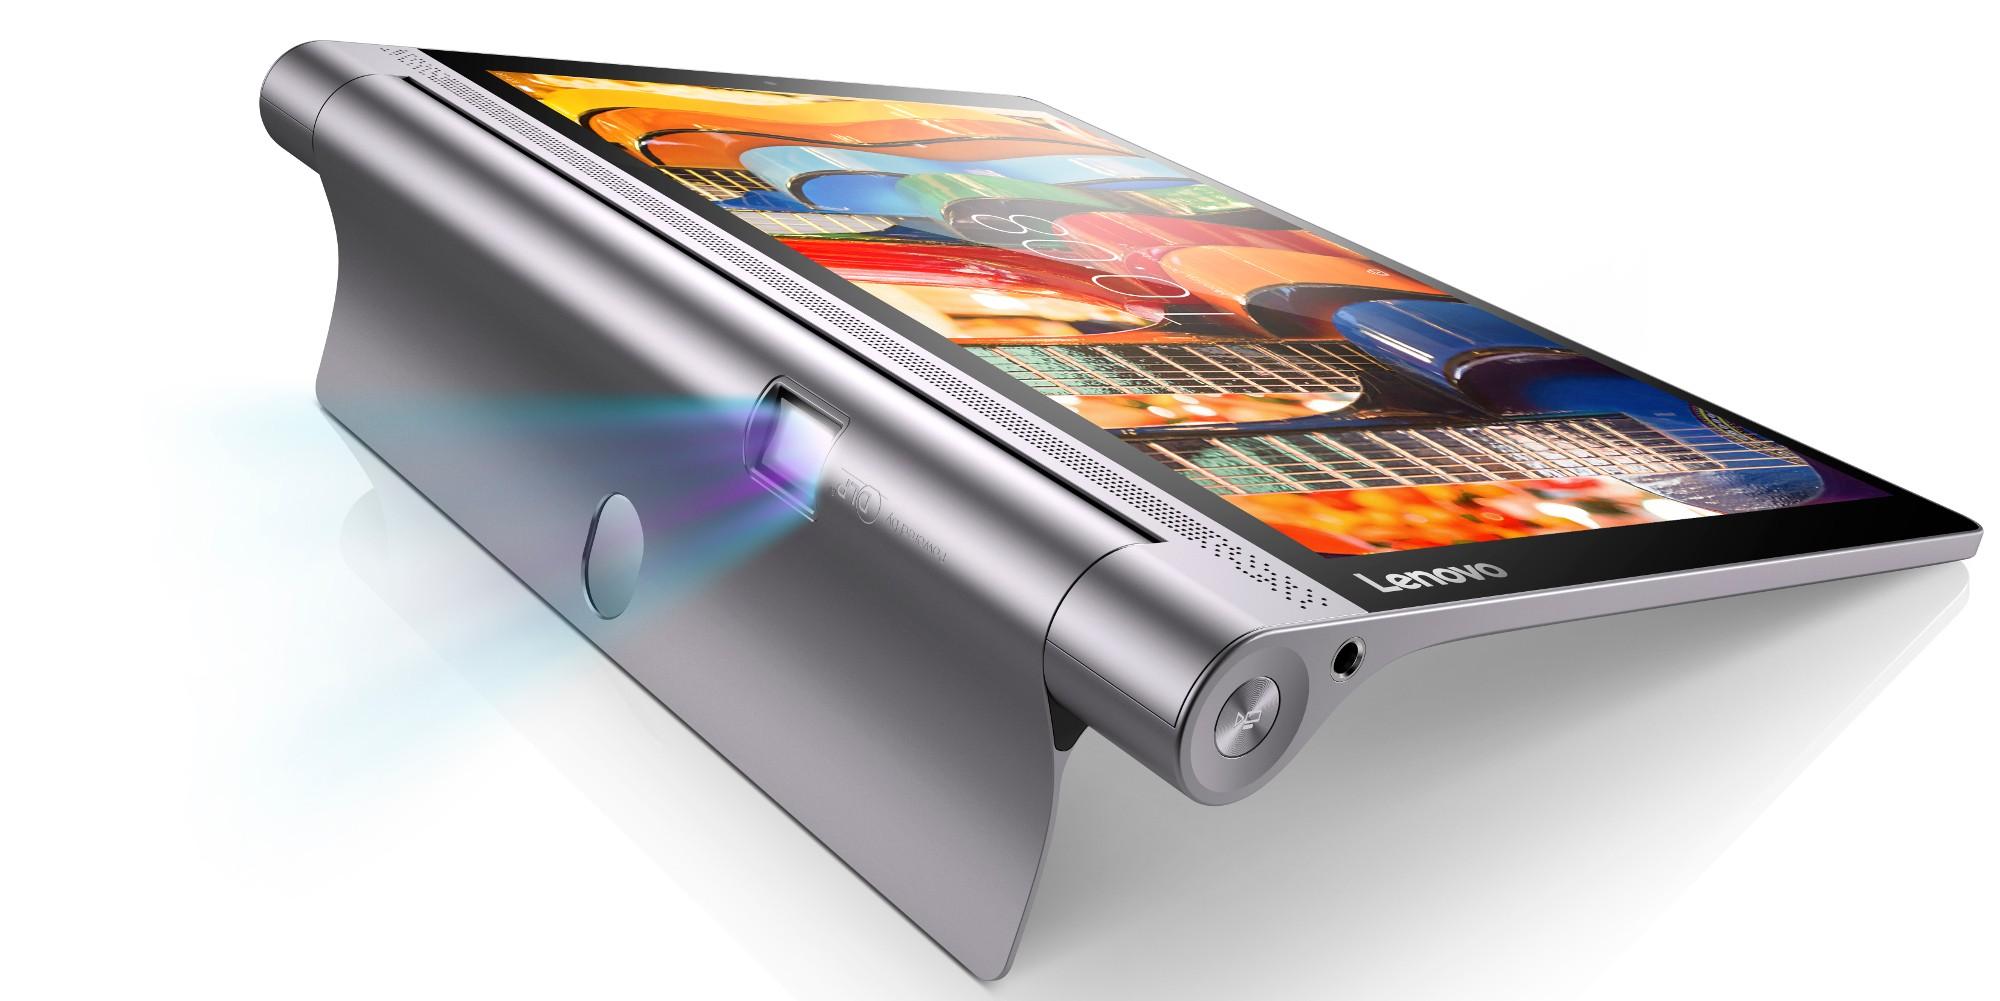 Lenovo Yoga Tab 3 Pro 10 με projector θα σε εντυπωσιάσει!